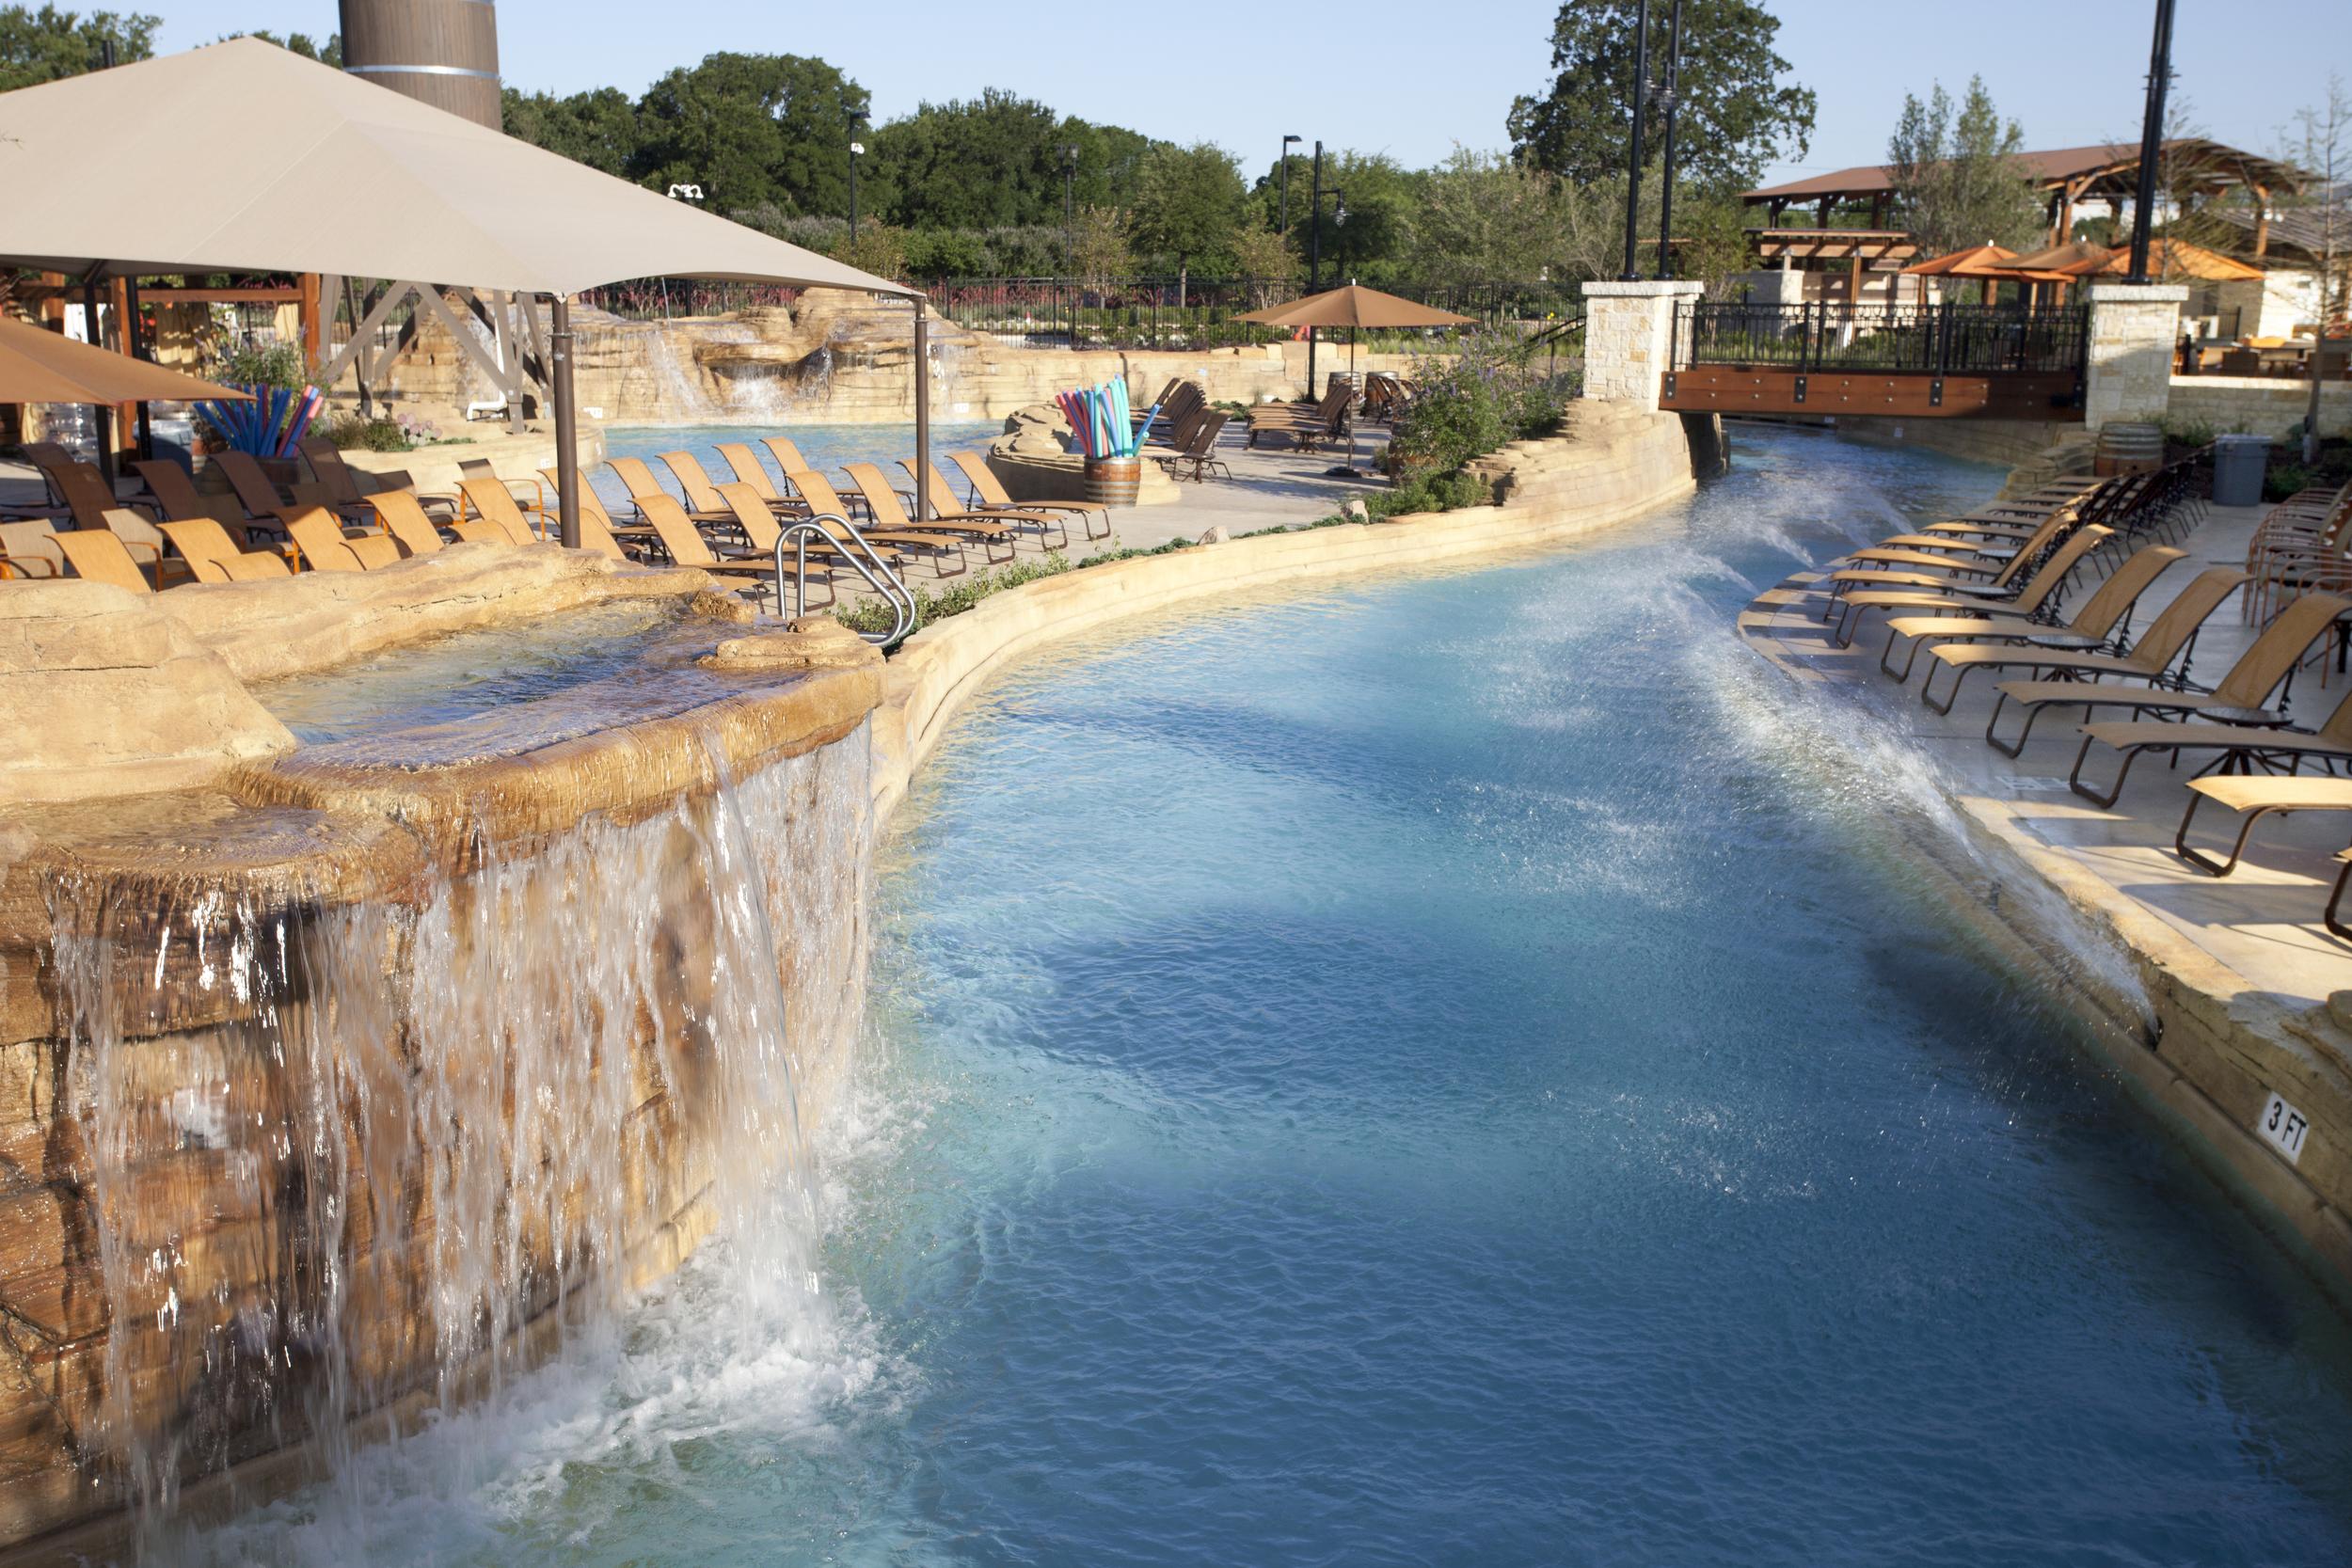 Gaylord Texan Lazy River